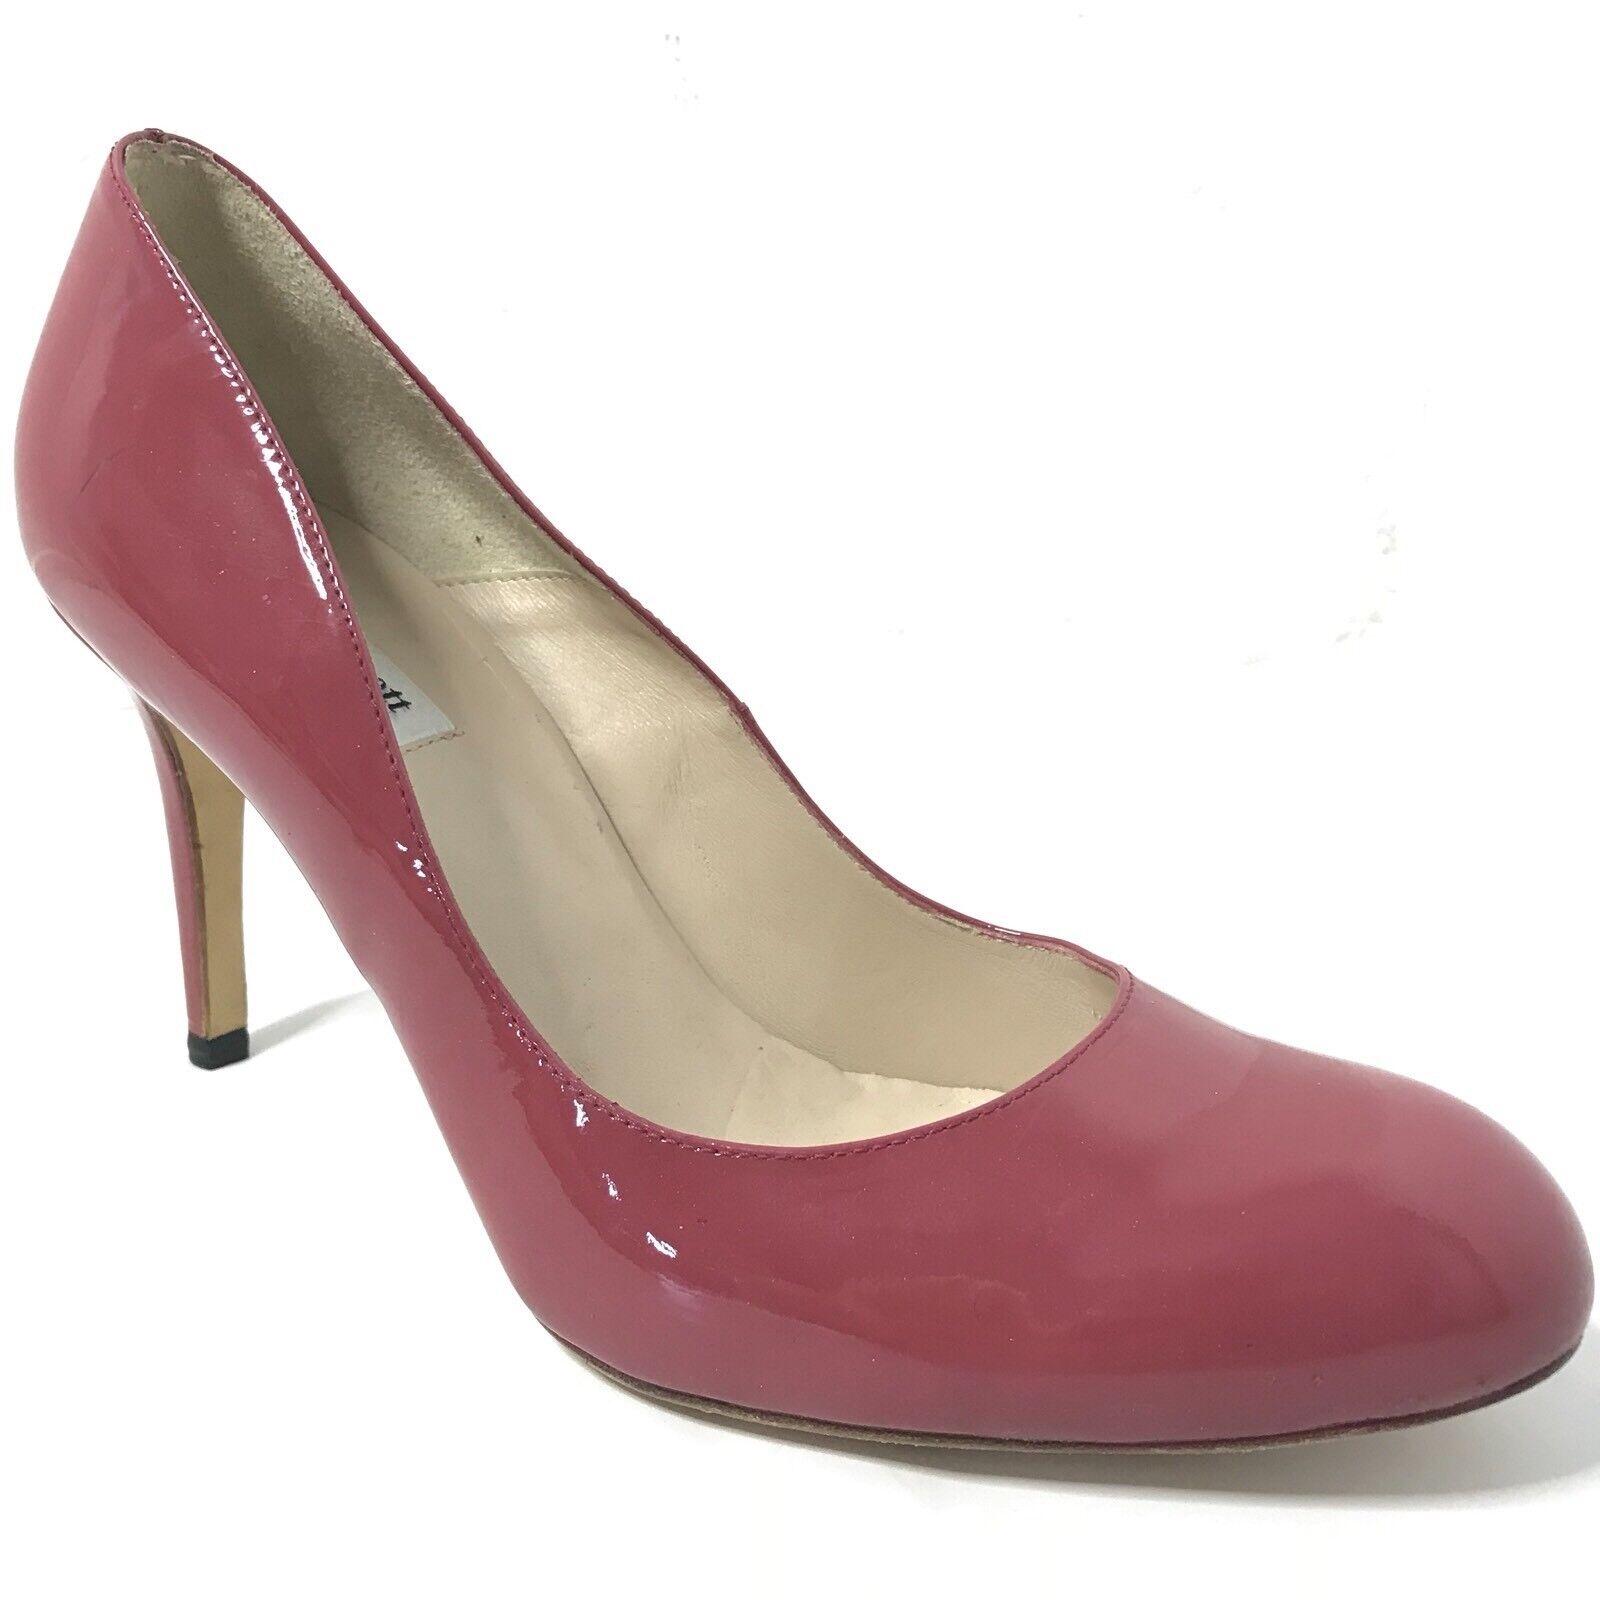 LK Bennett Heels Pumps Patent Leather Red Pink Women's 41  10 10.5 11